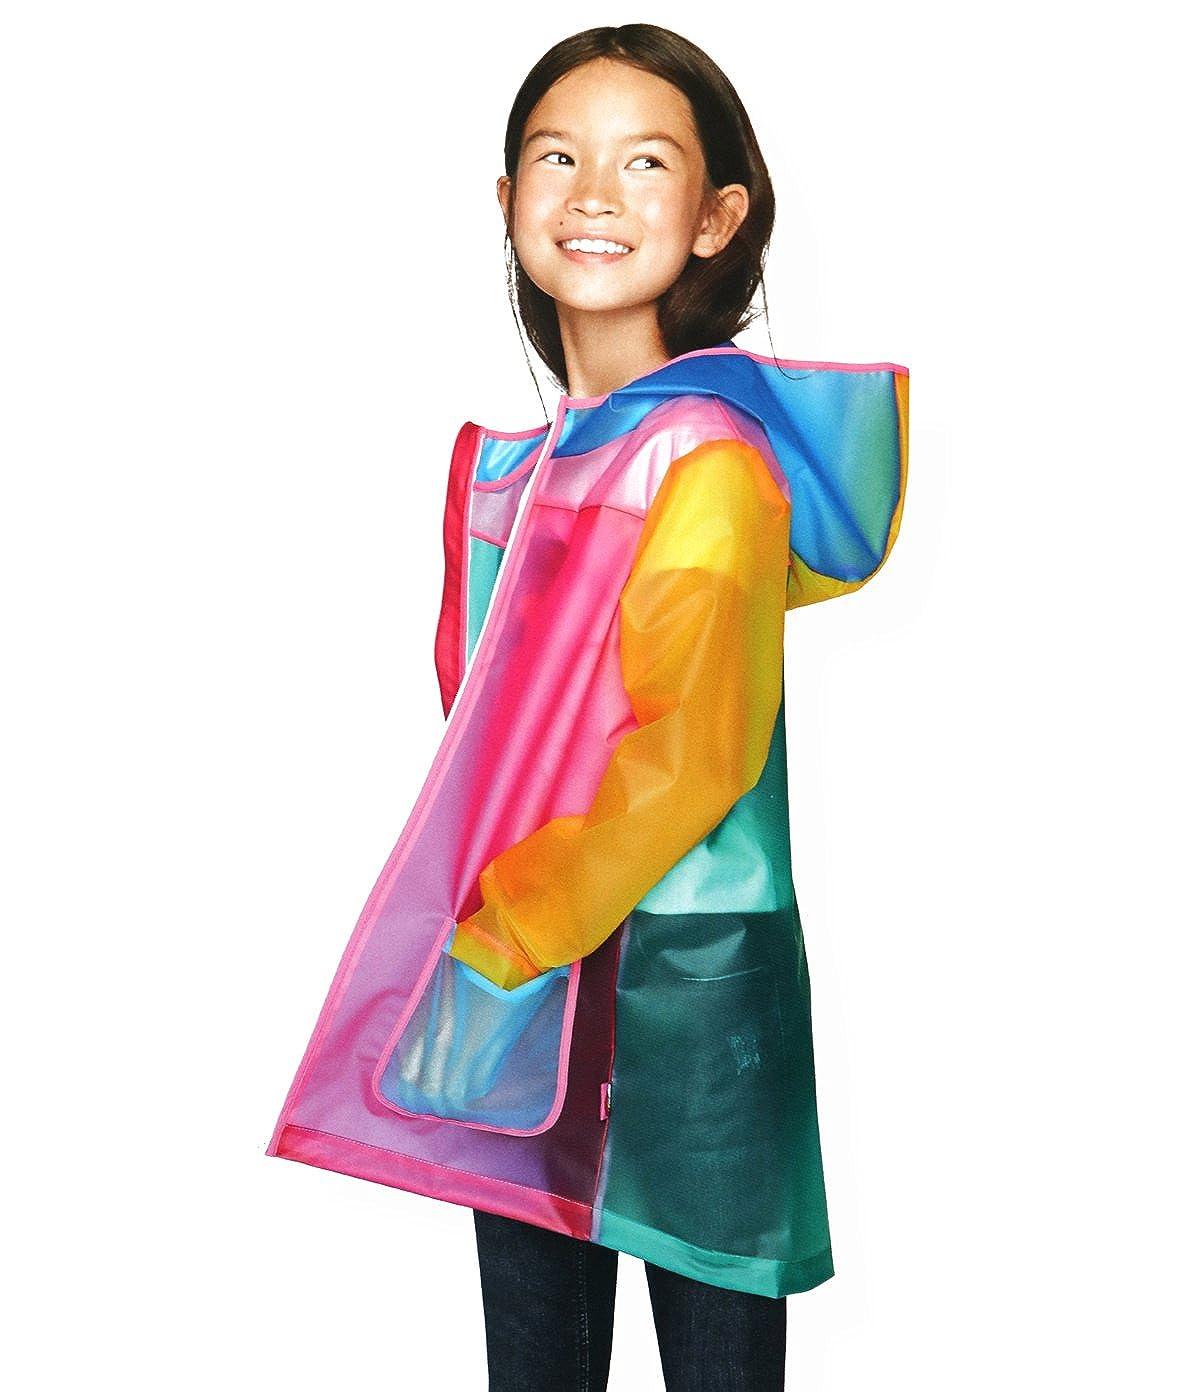 CADong Little Girls'color TPU Waterproof Hooded Coat Jacket Outwear Raincoat